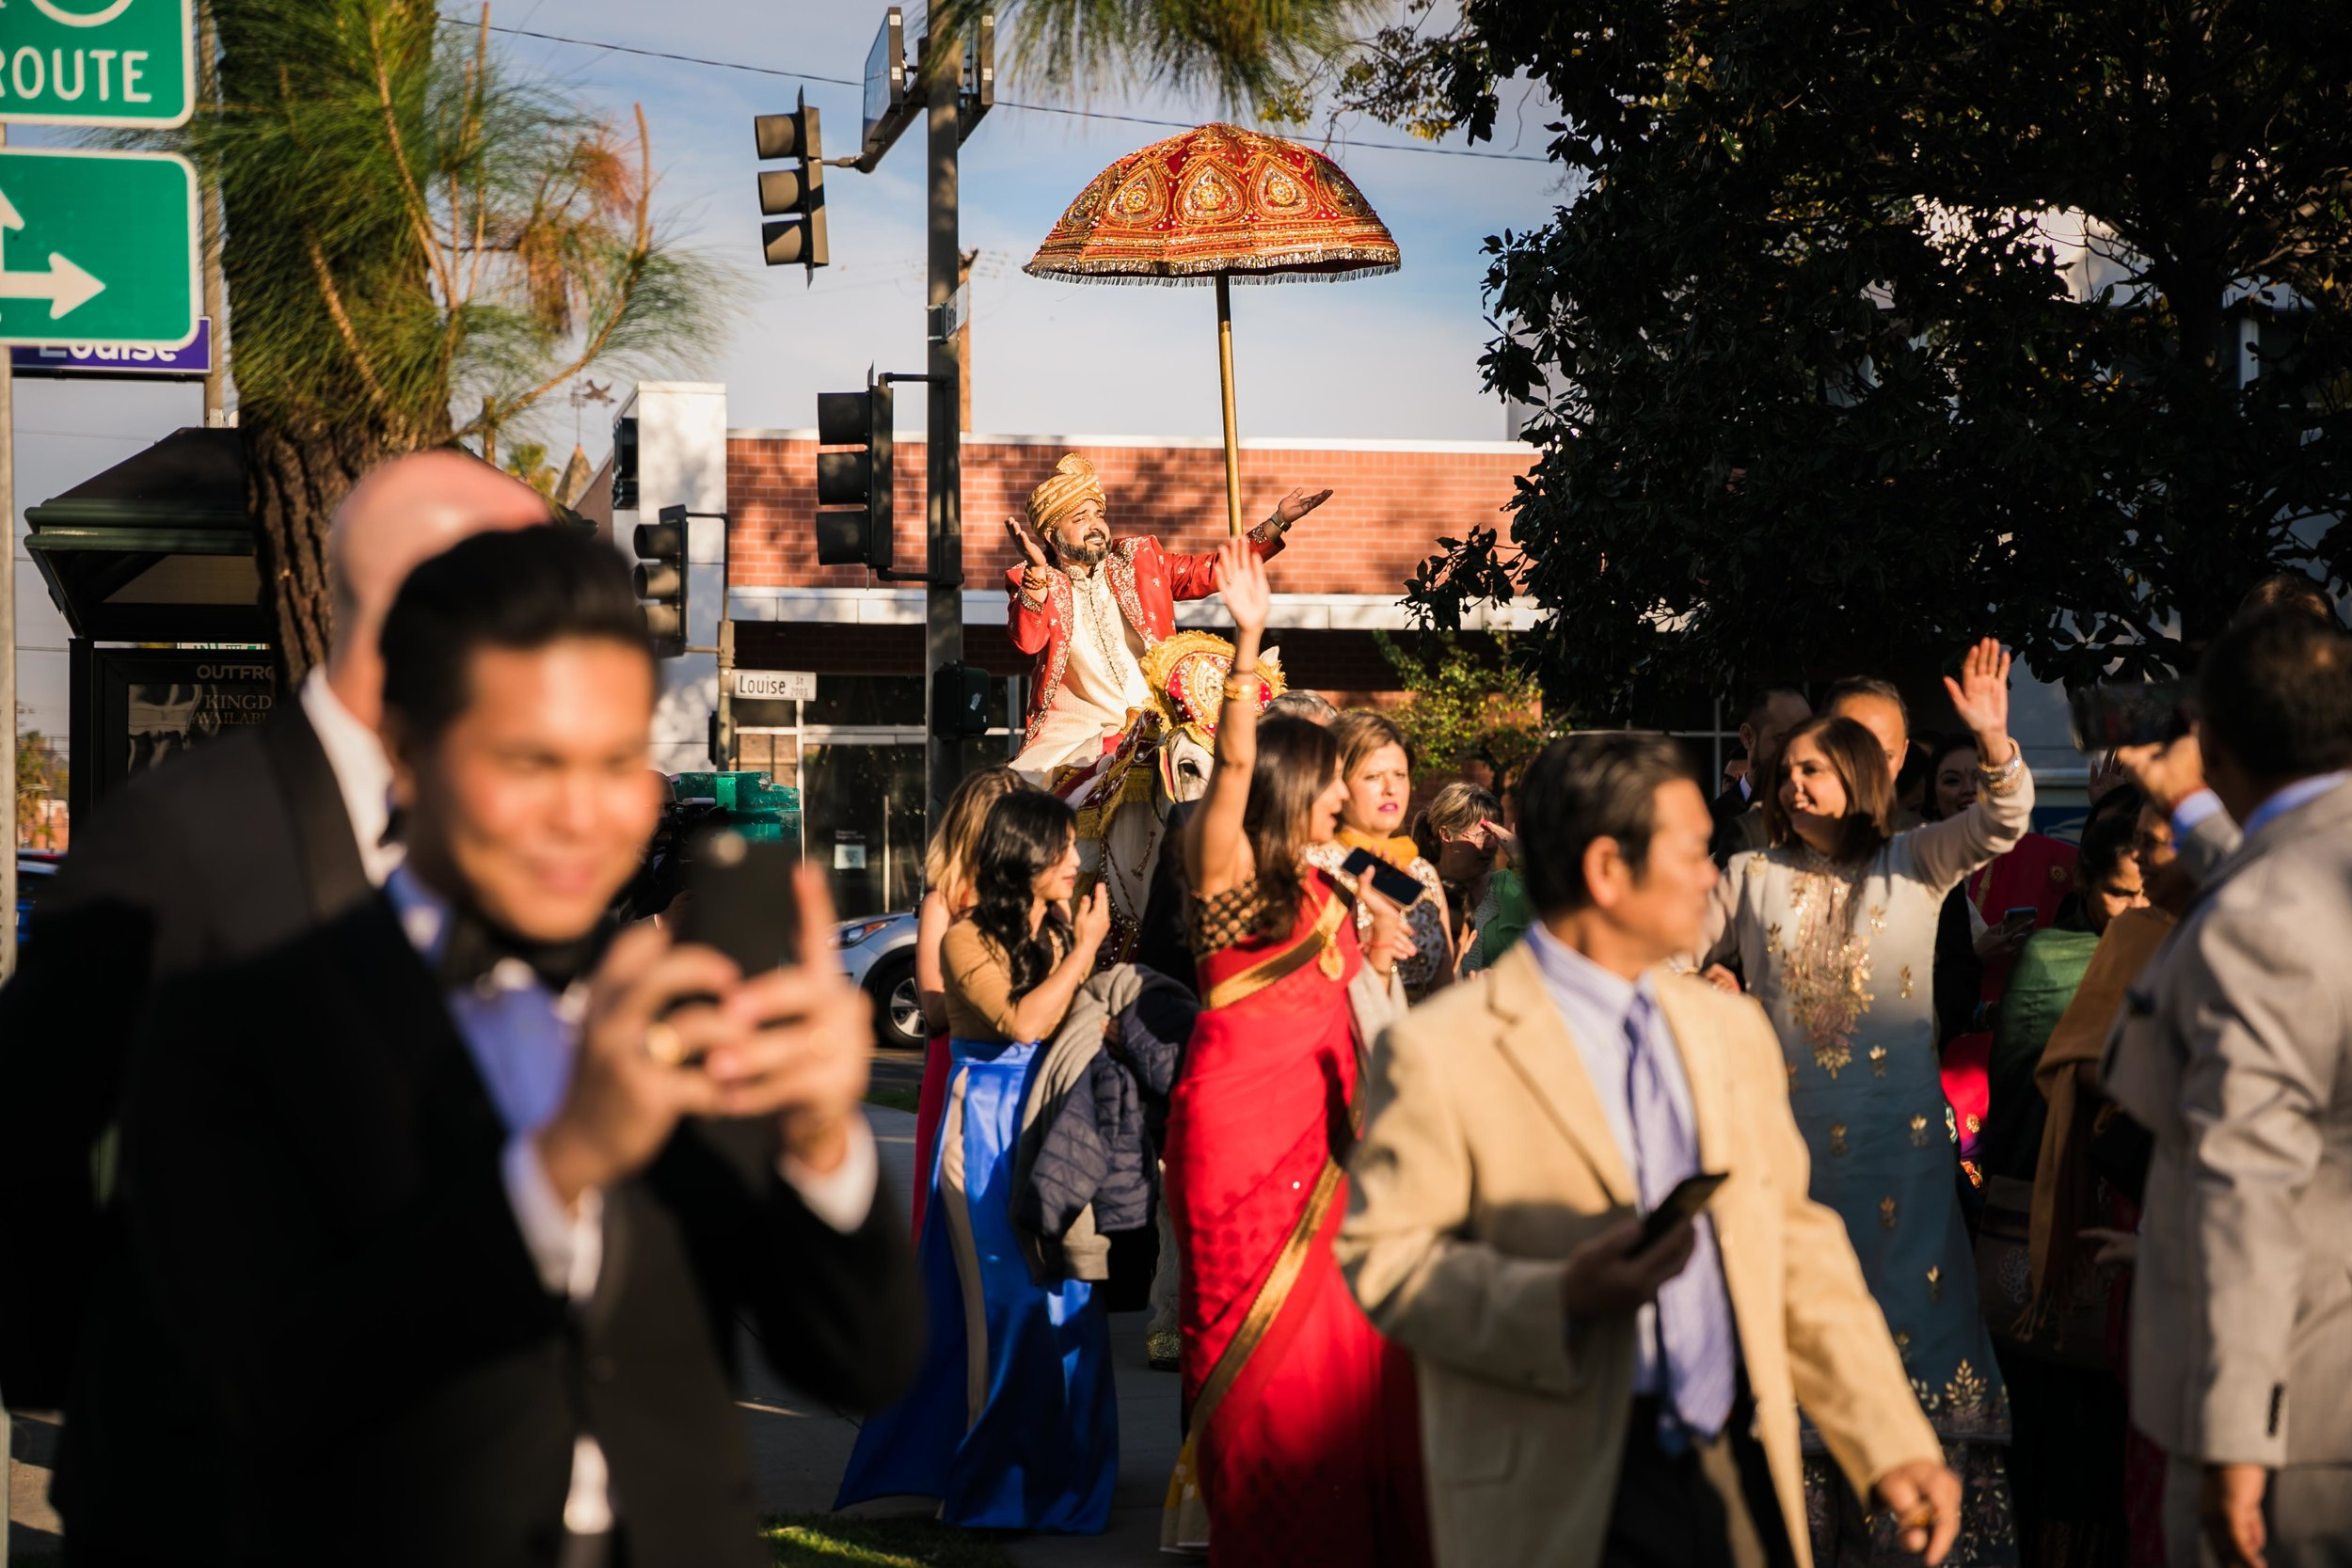 indian_southern_california_wedding_joshuachun_photography-5.JPG